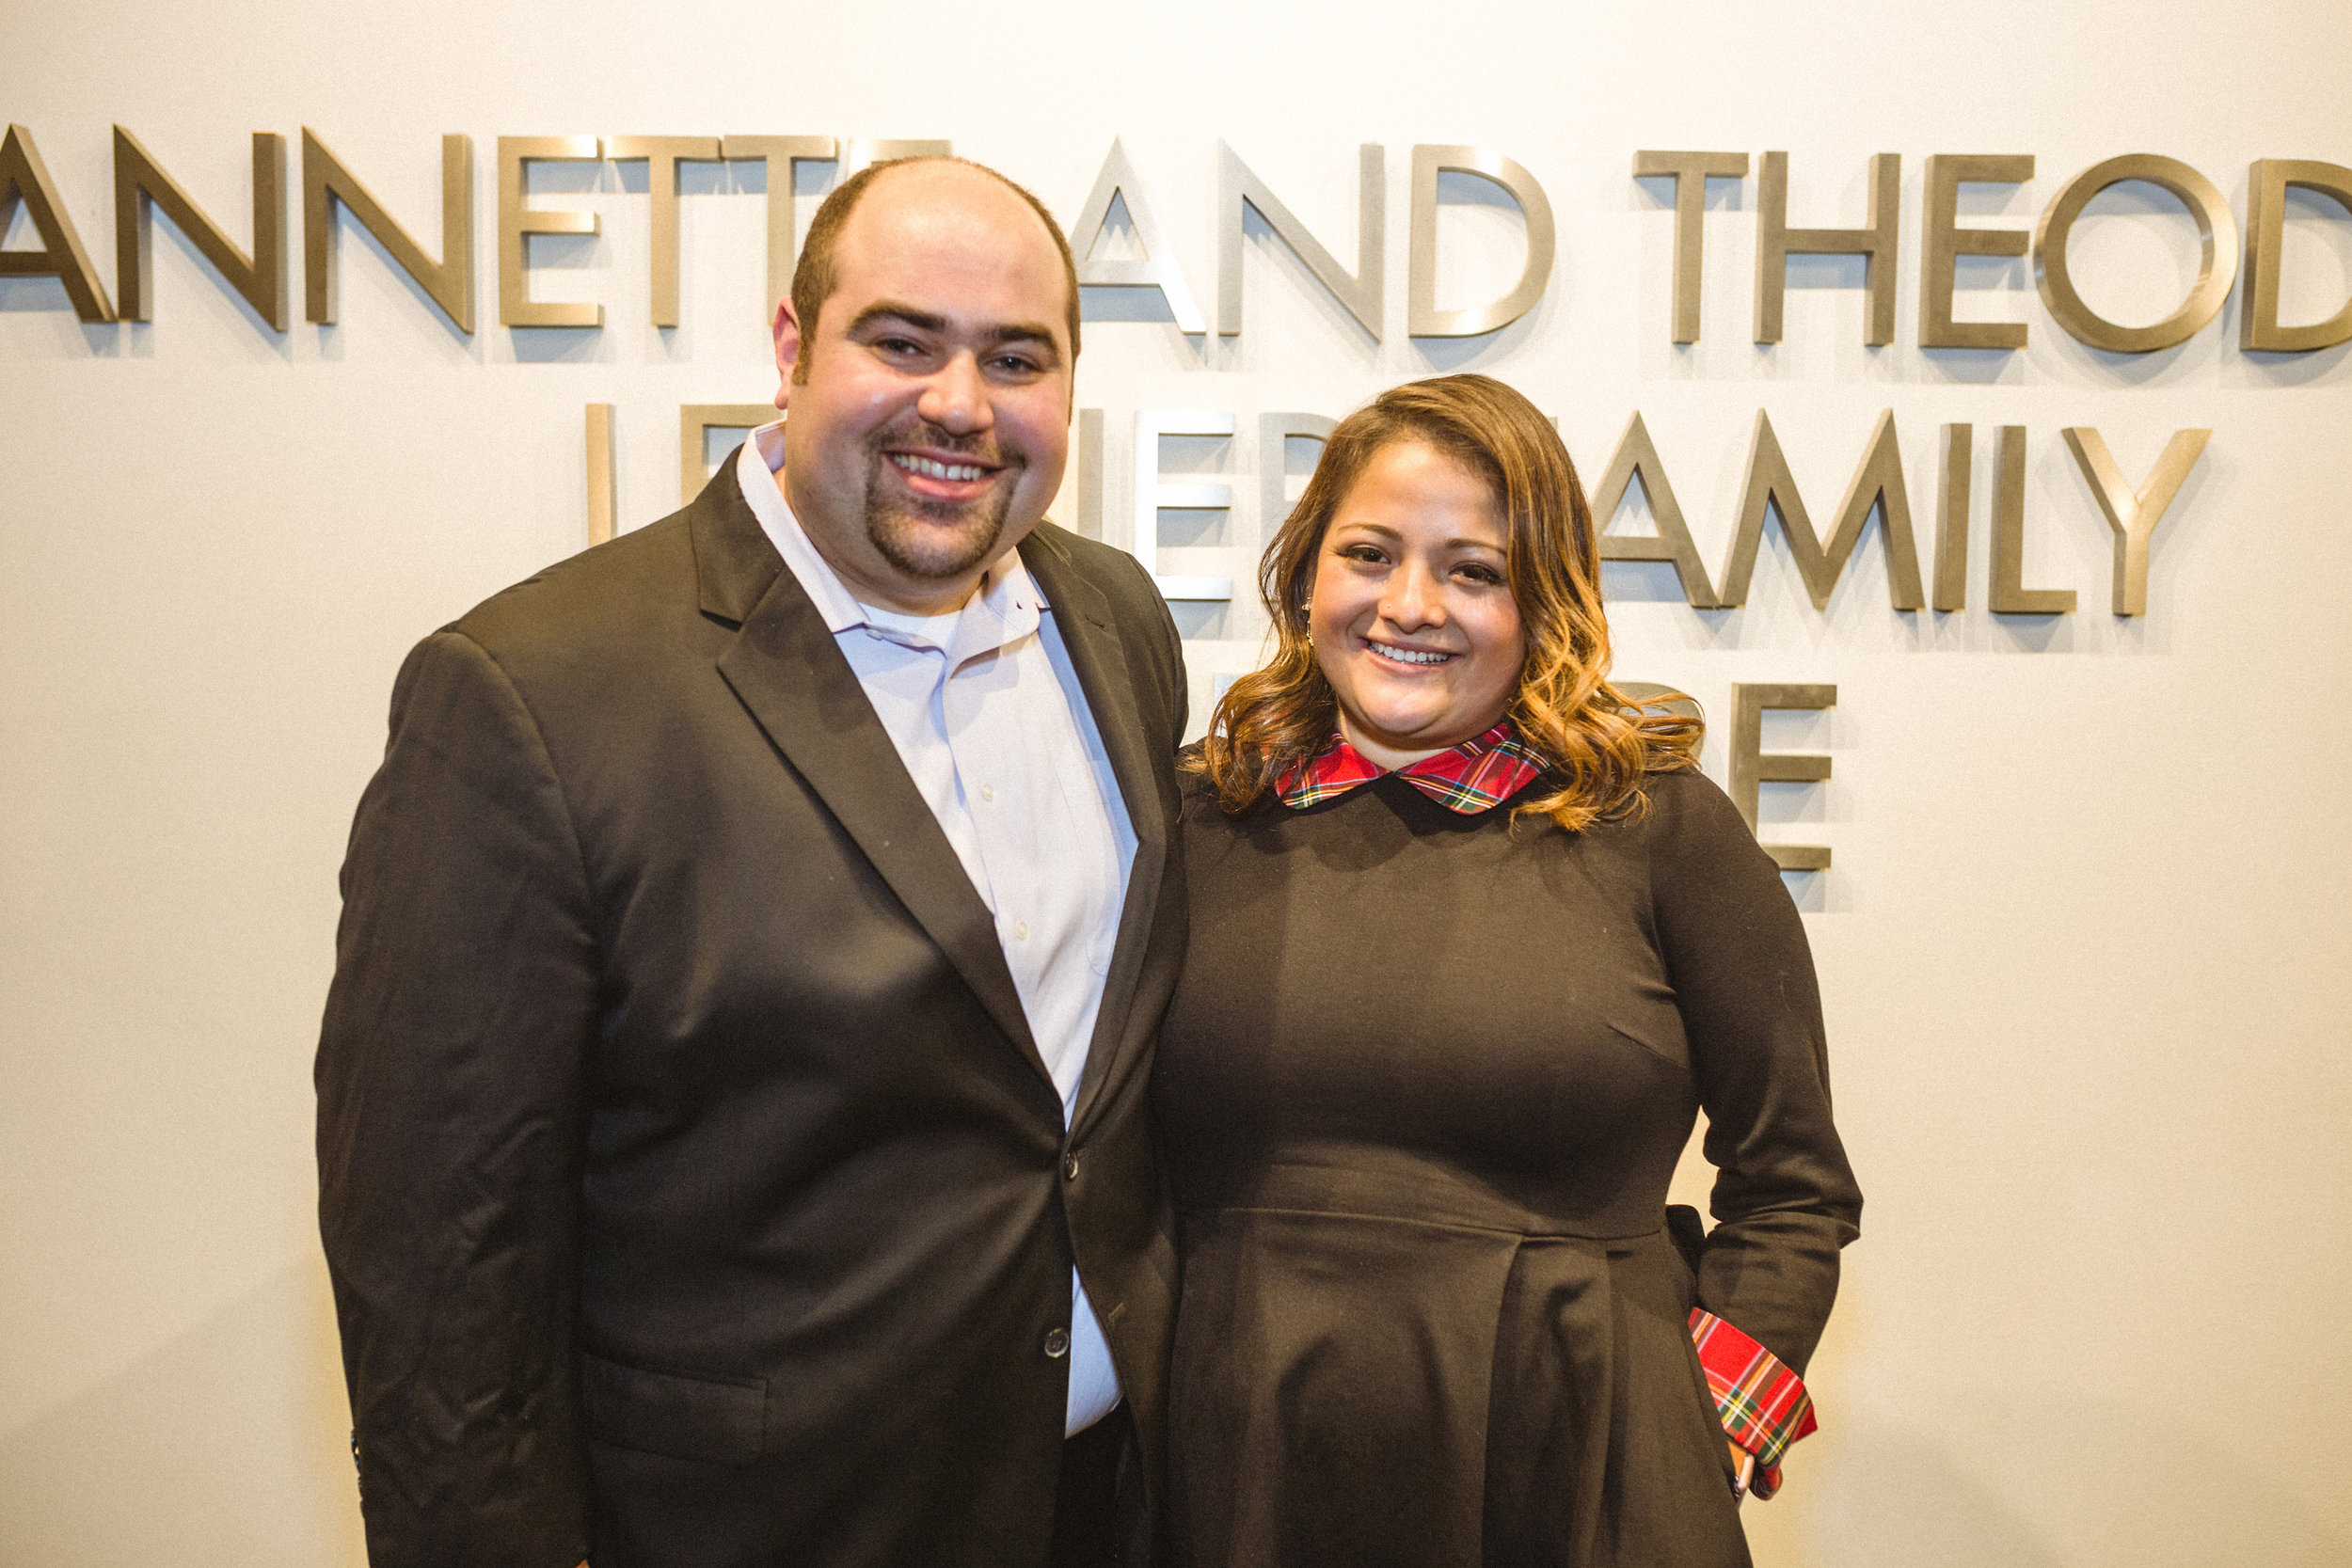 Matthew & Teresa Woorman